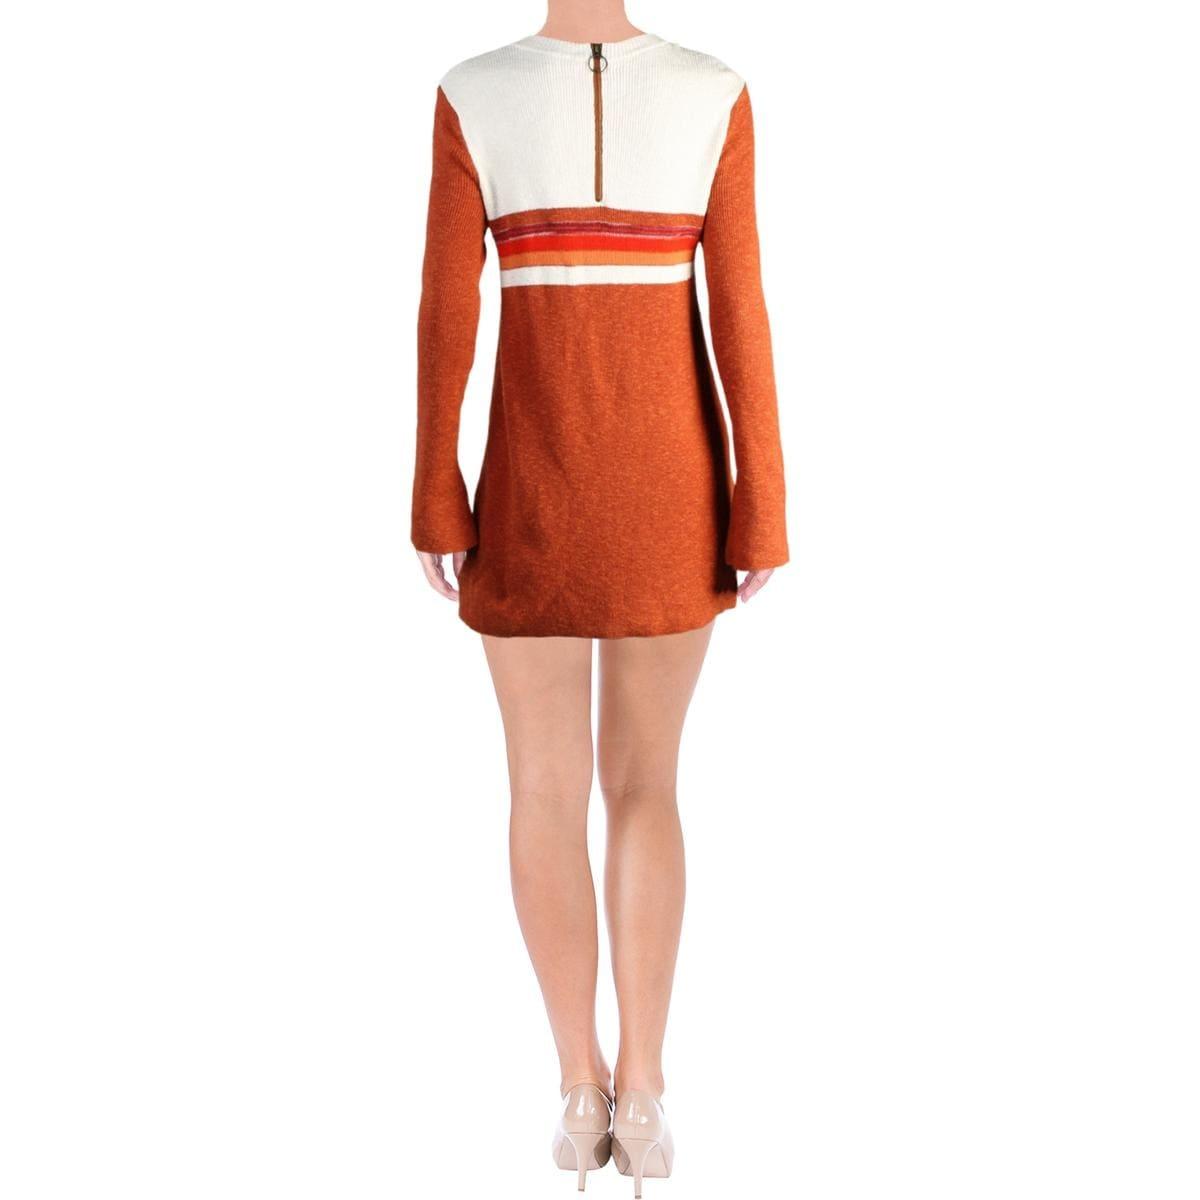 Shop Free People Womens Sweaterdress Linen Colorblock Overstock 17430023